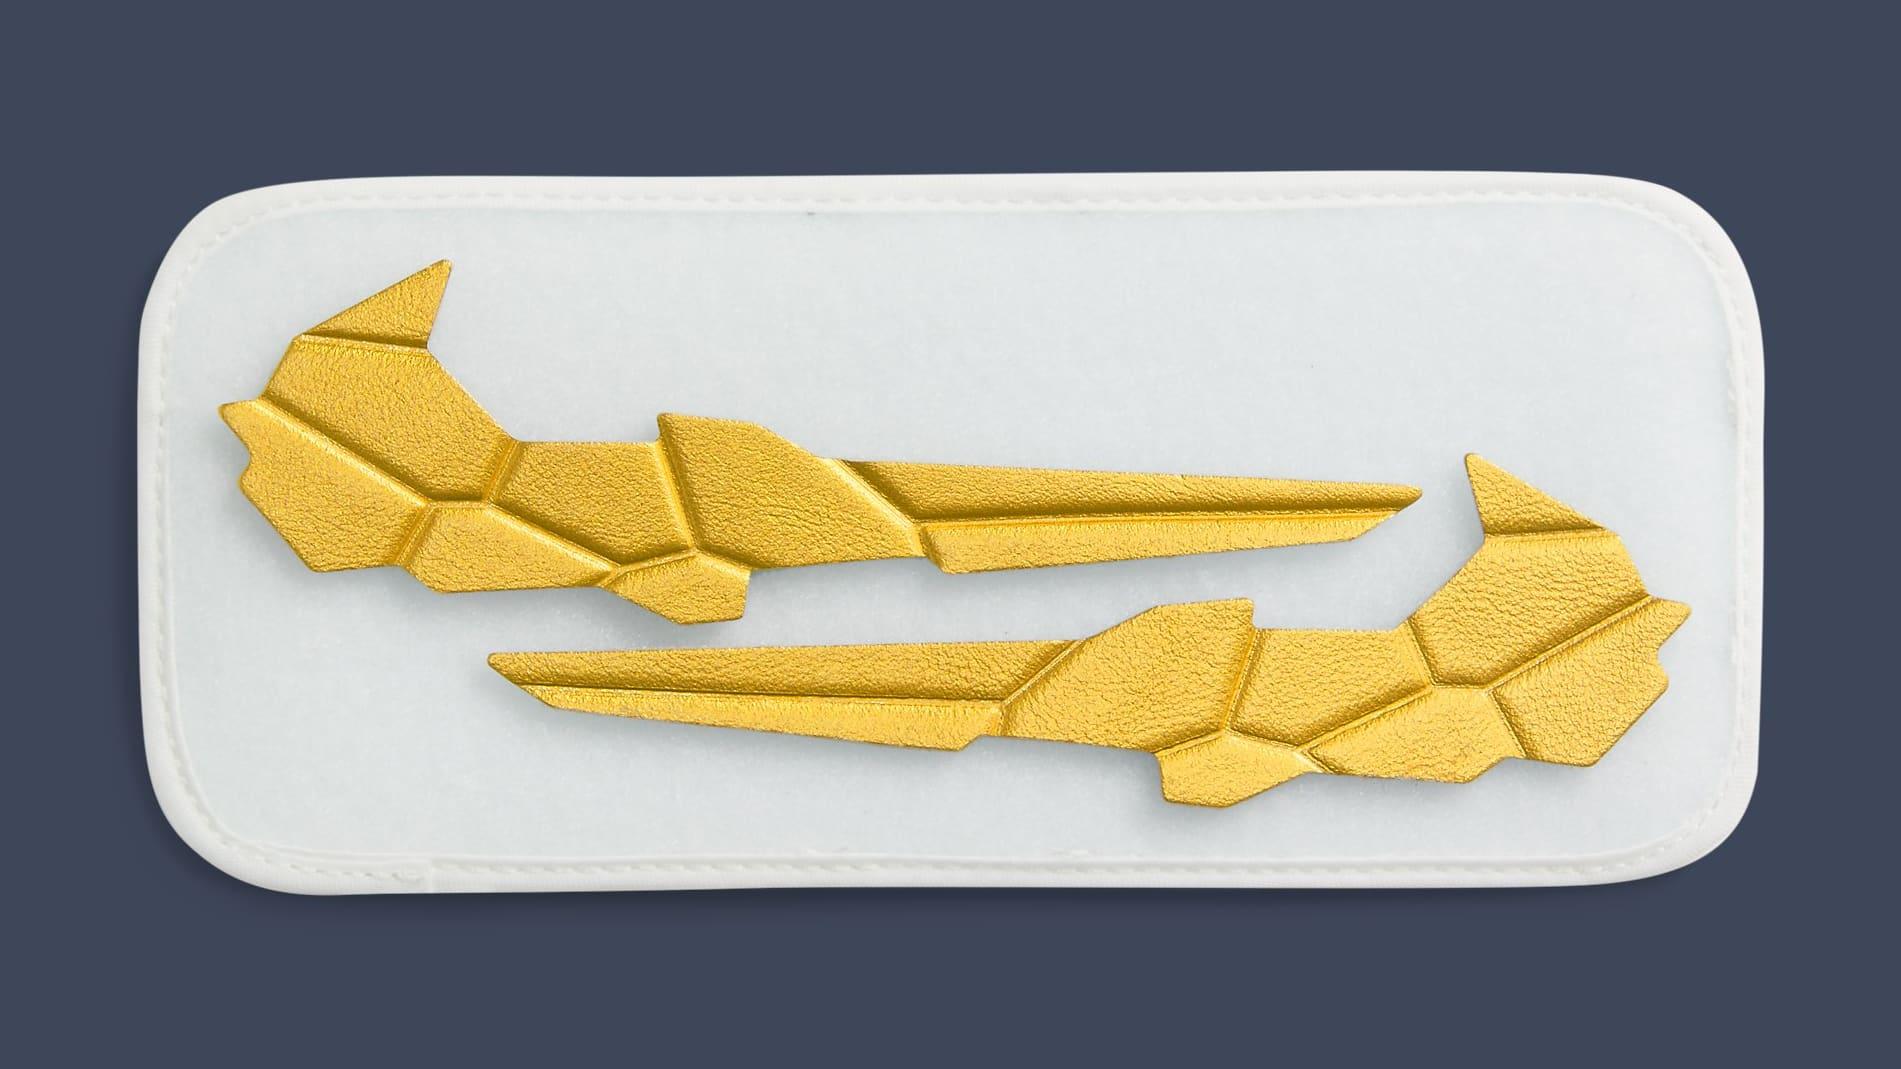 Nike SB Dunk High Gundam White Release Date DH7717-100 Yellow Swoosh